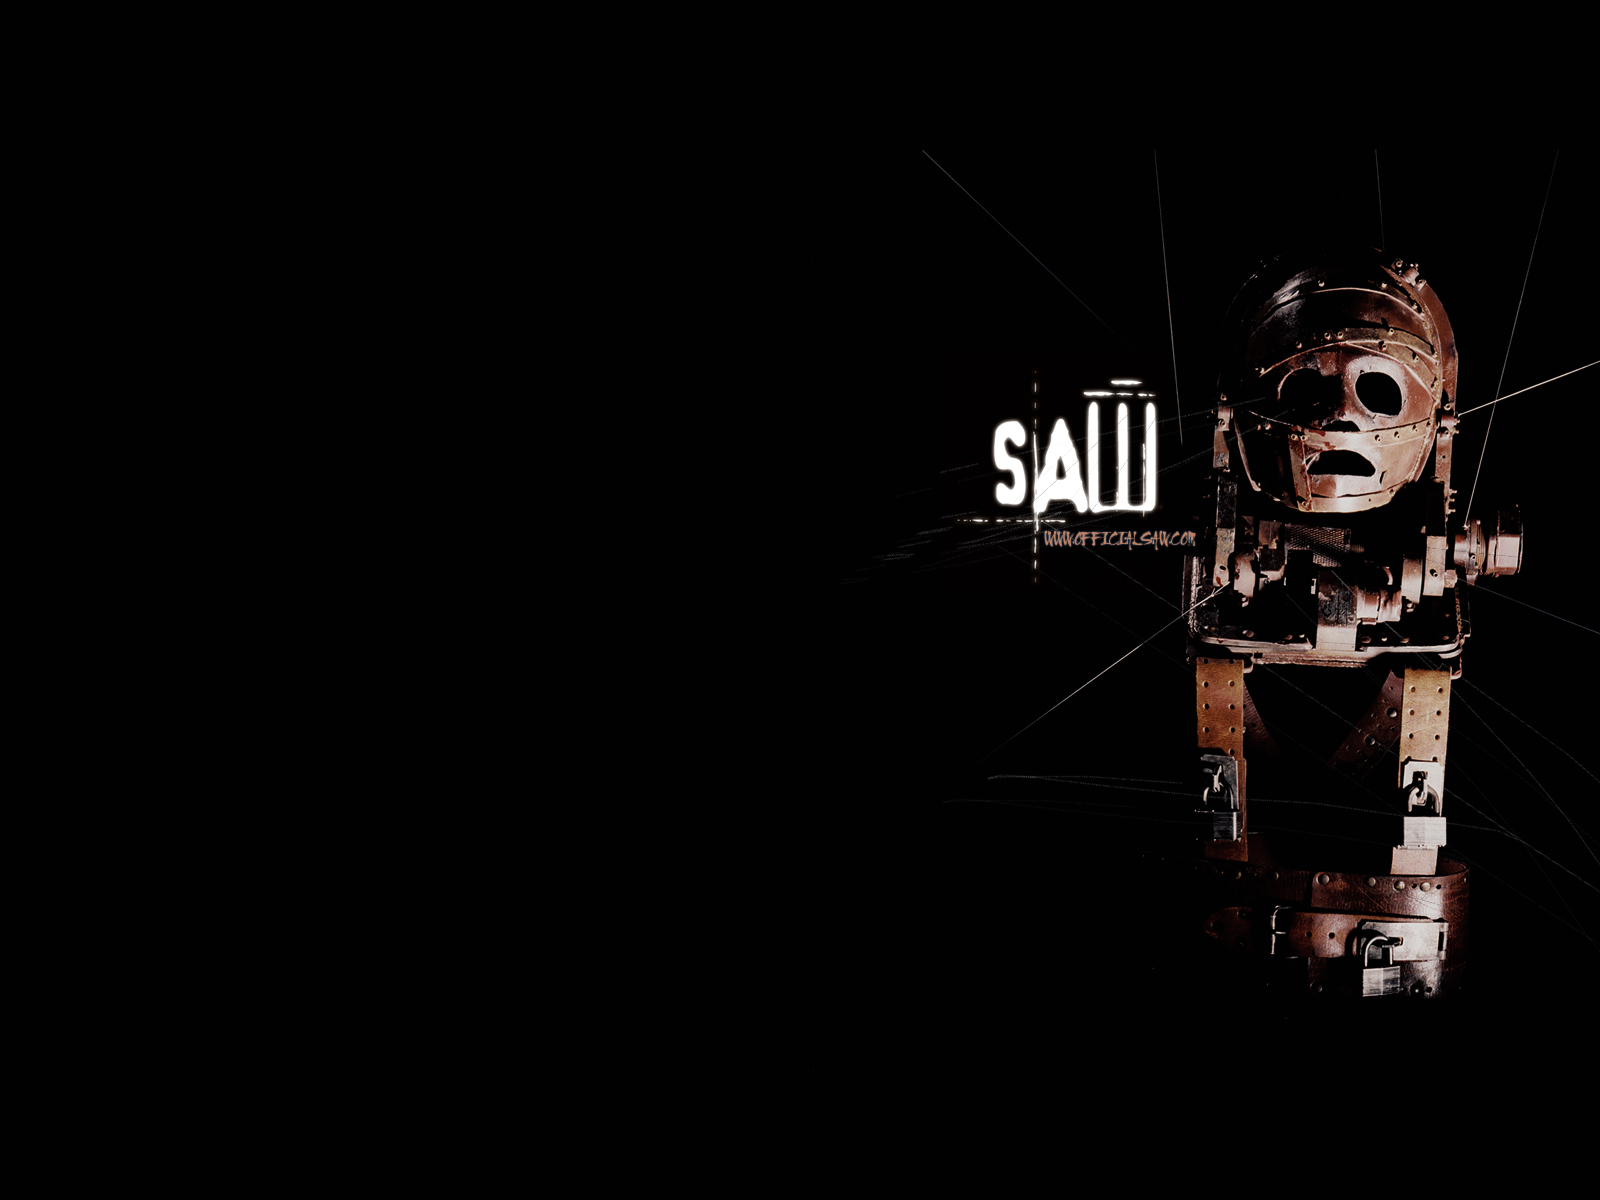 Saw Wallpaper   Horror Movies Wallpaper 8767324 1600x1200